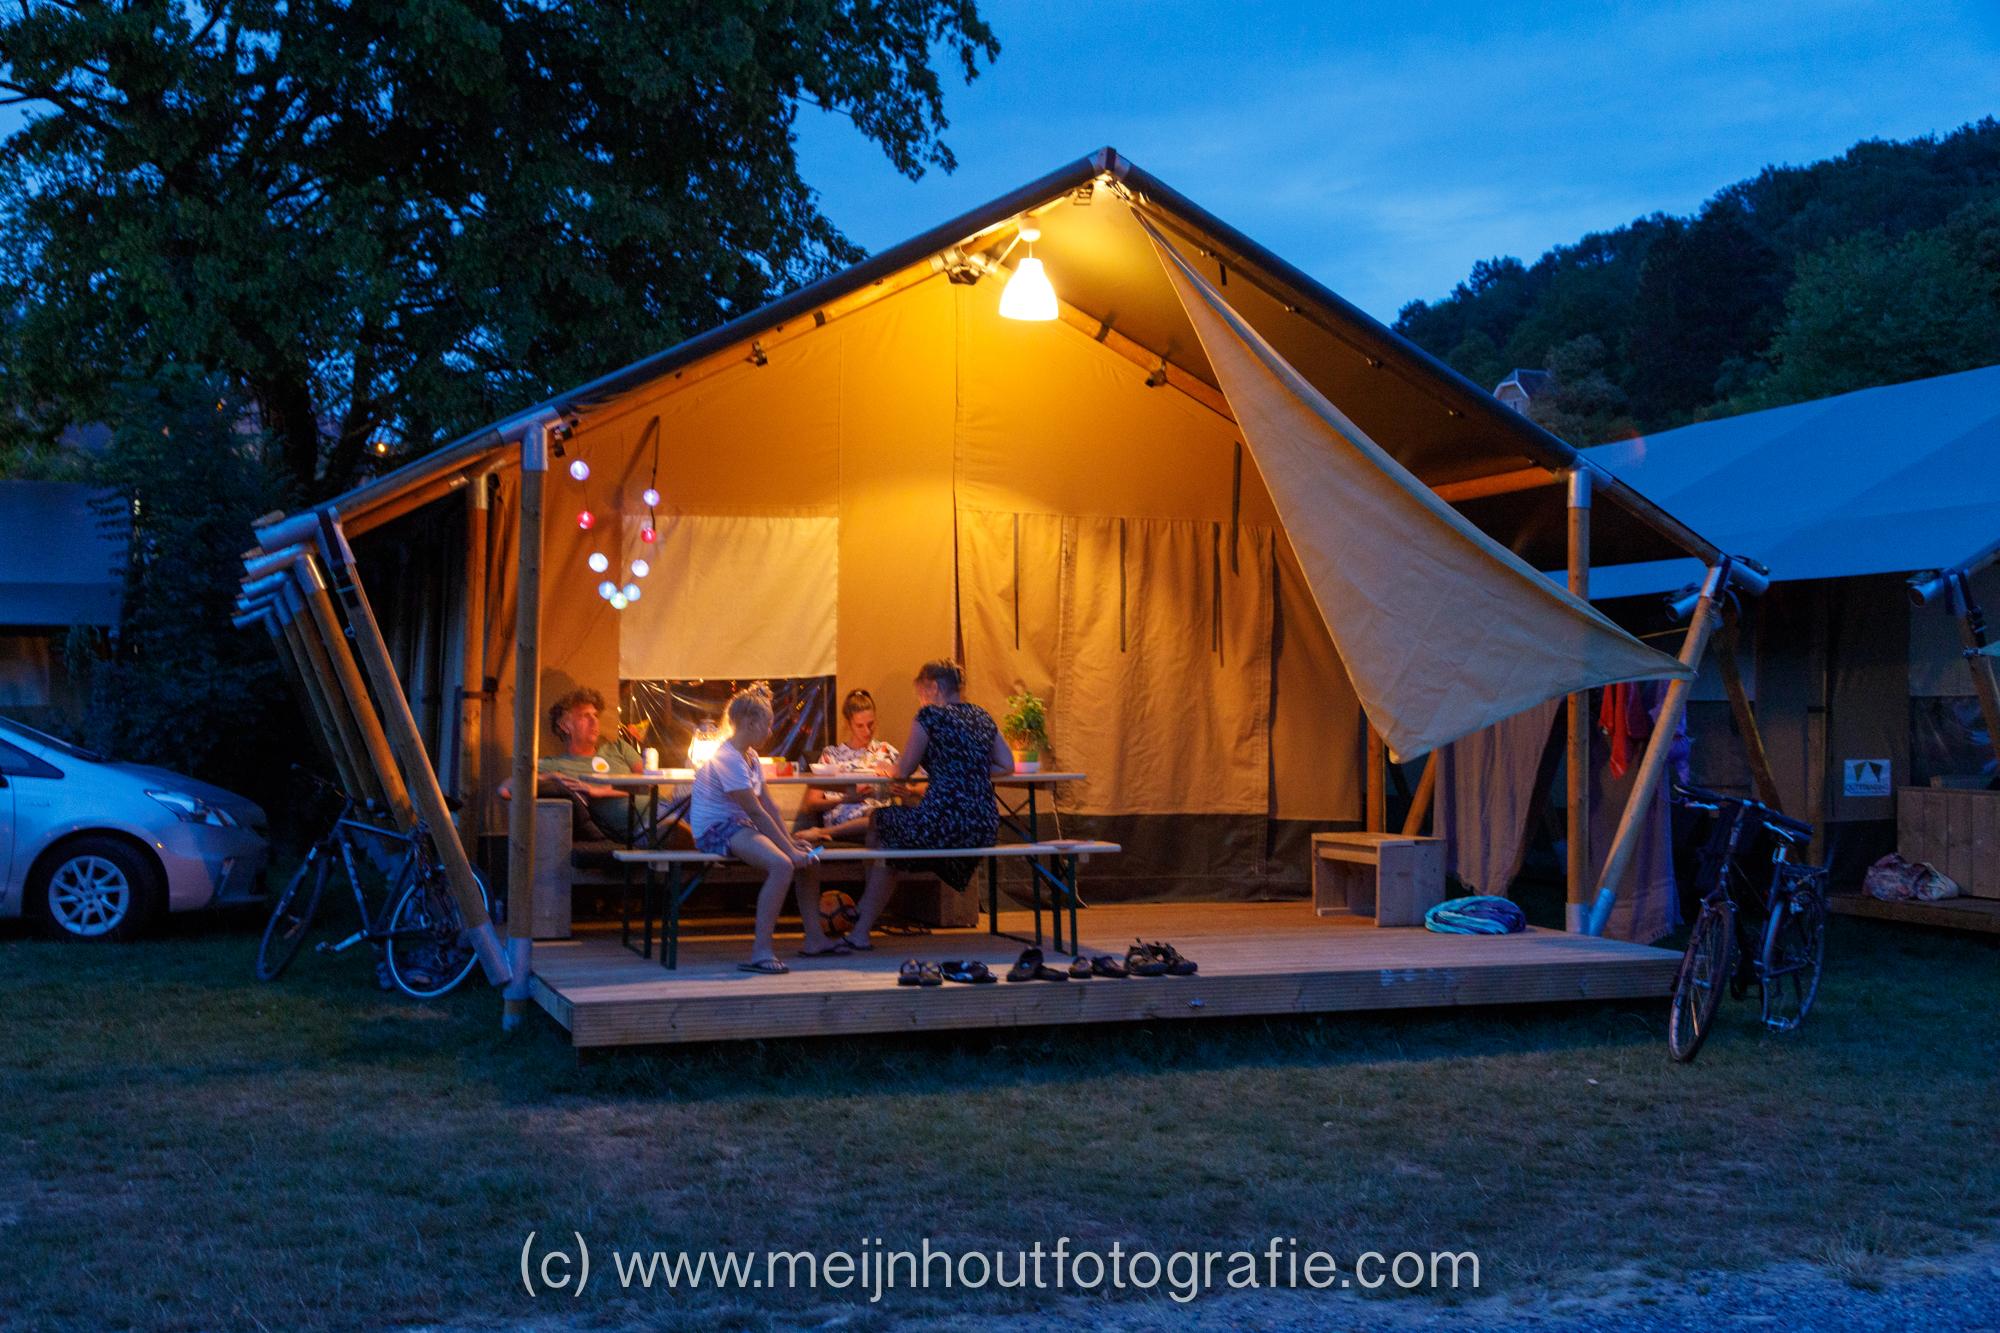 20180729-_MG_9655 Camping Sy Ardennen Belgium.jpg